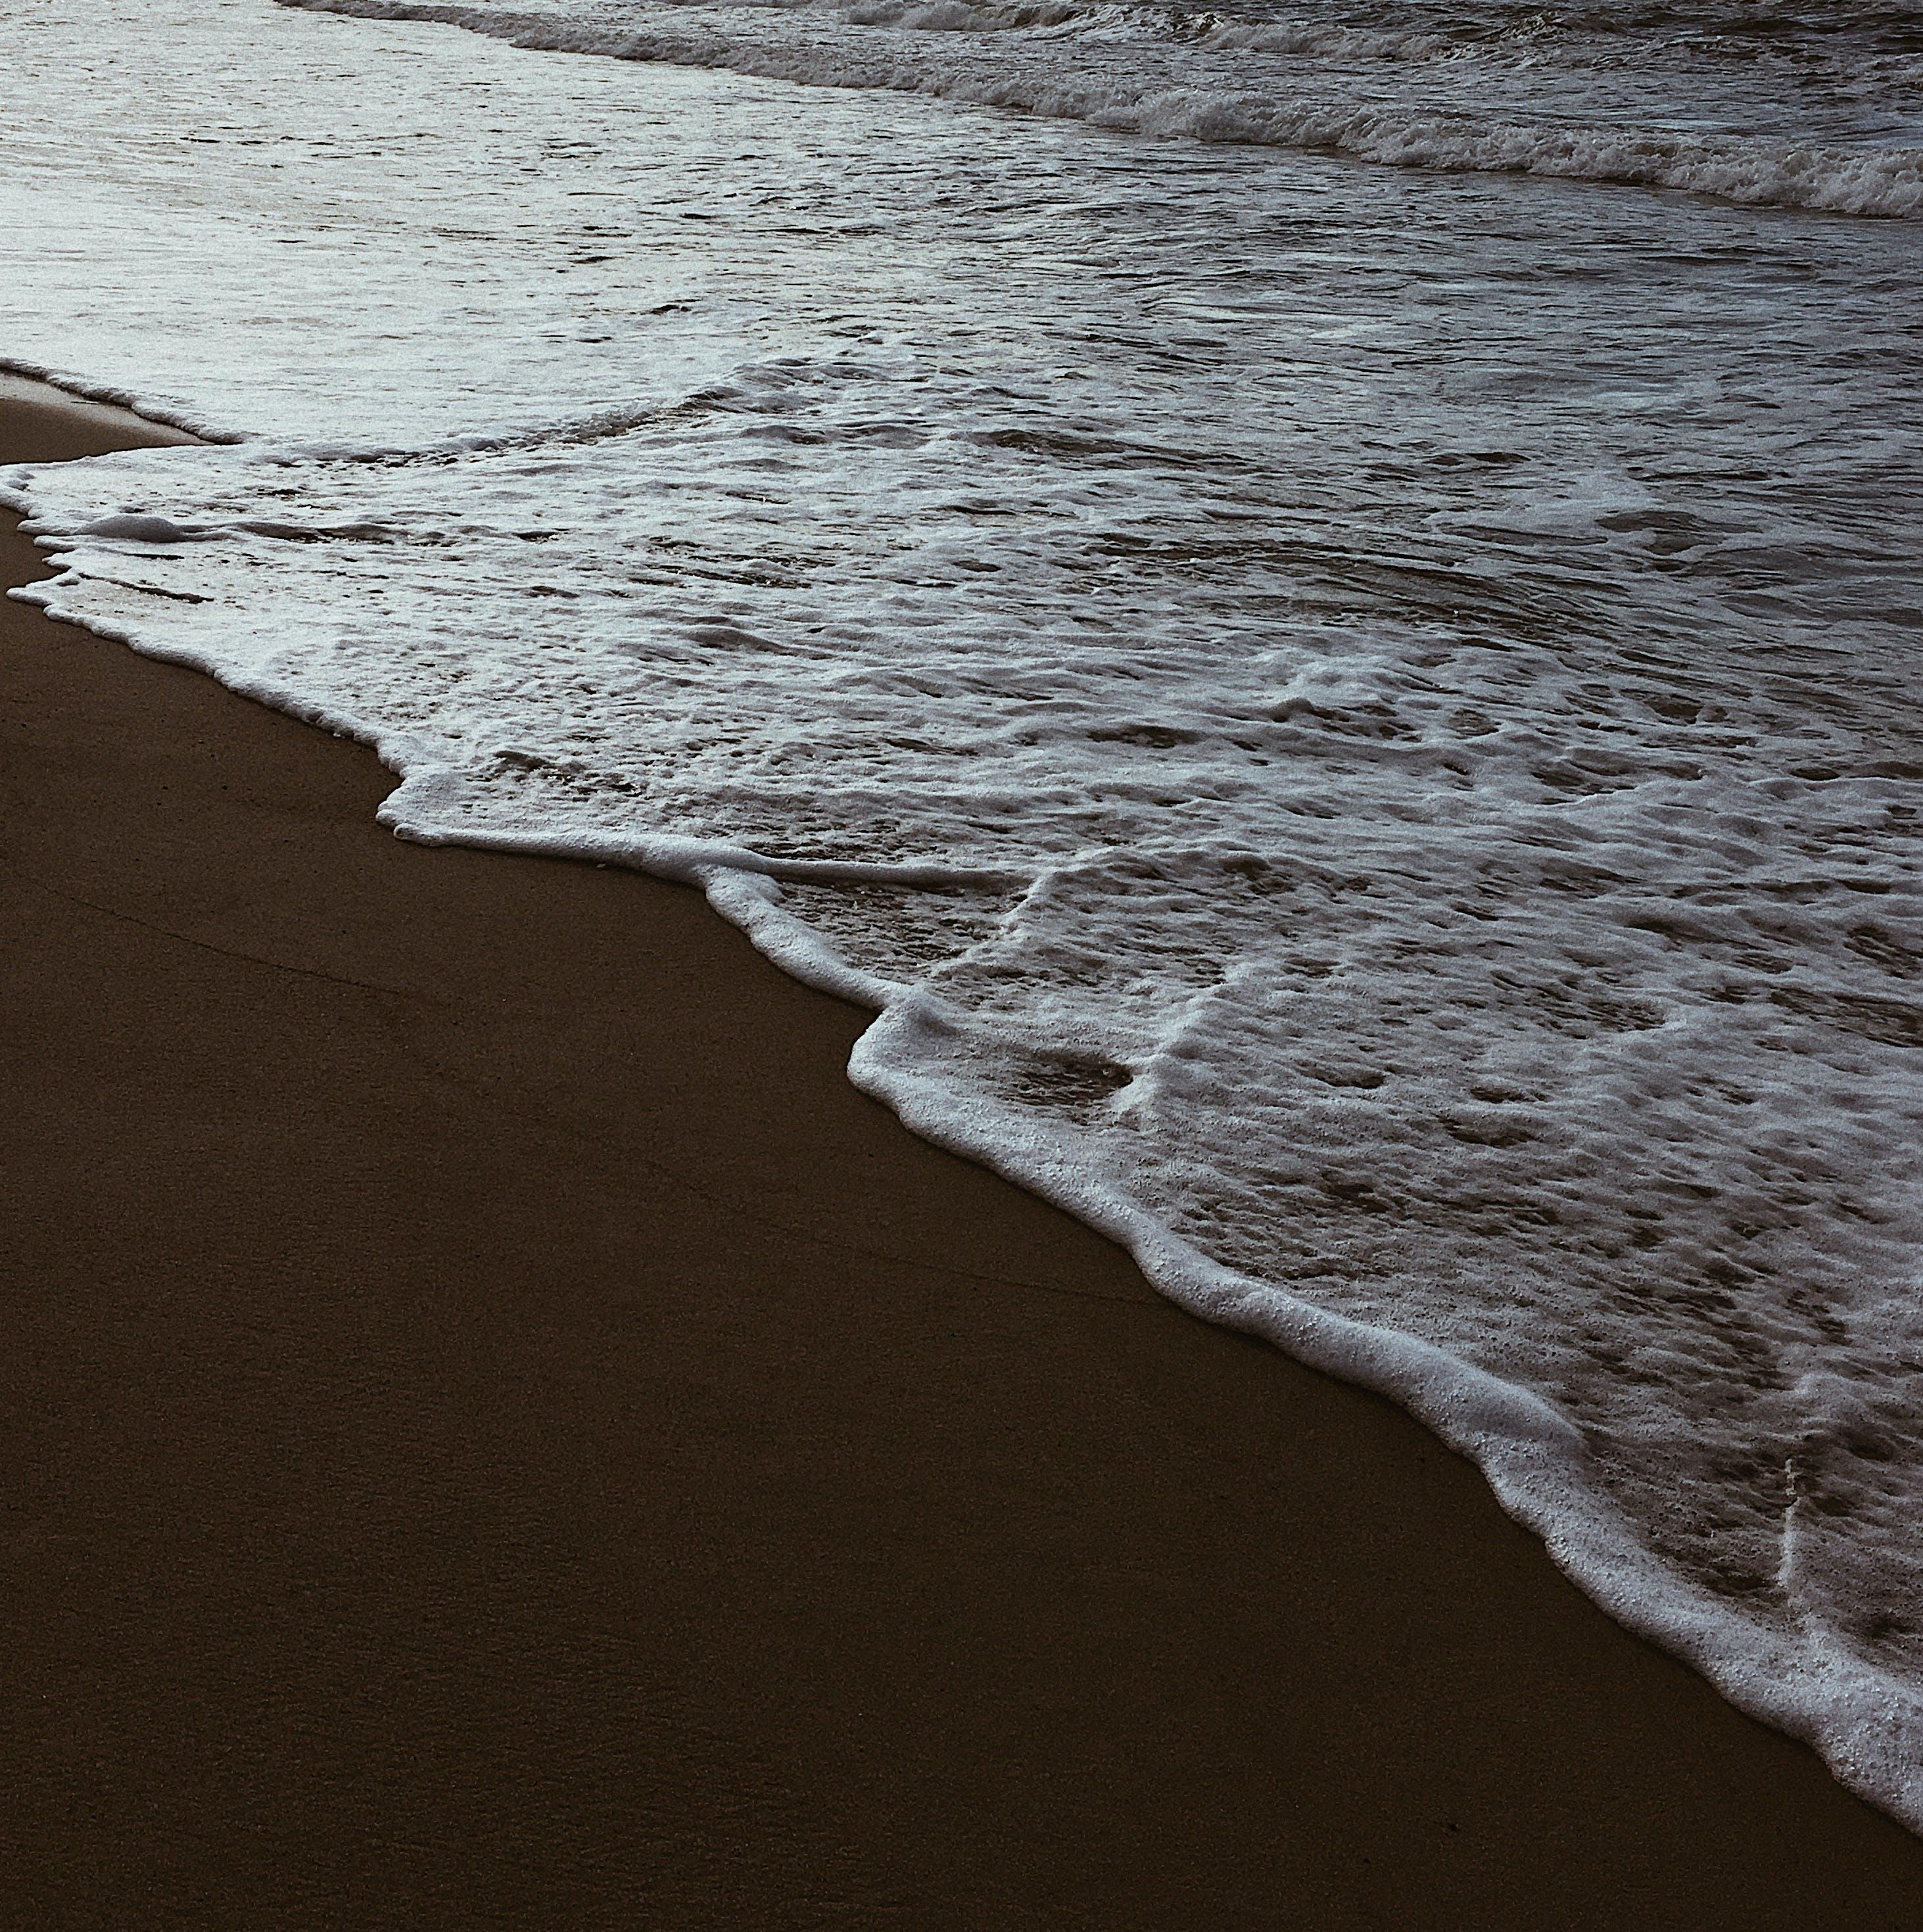 Sea Foam on by the Beach